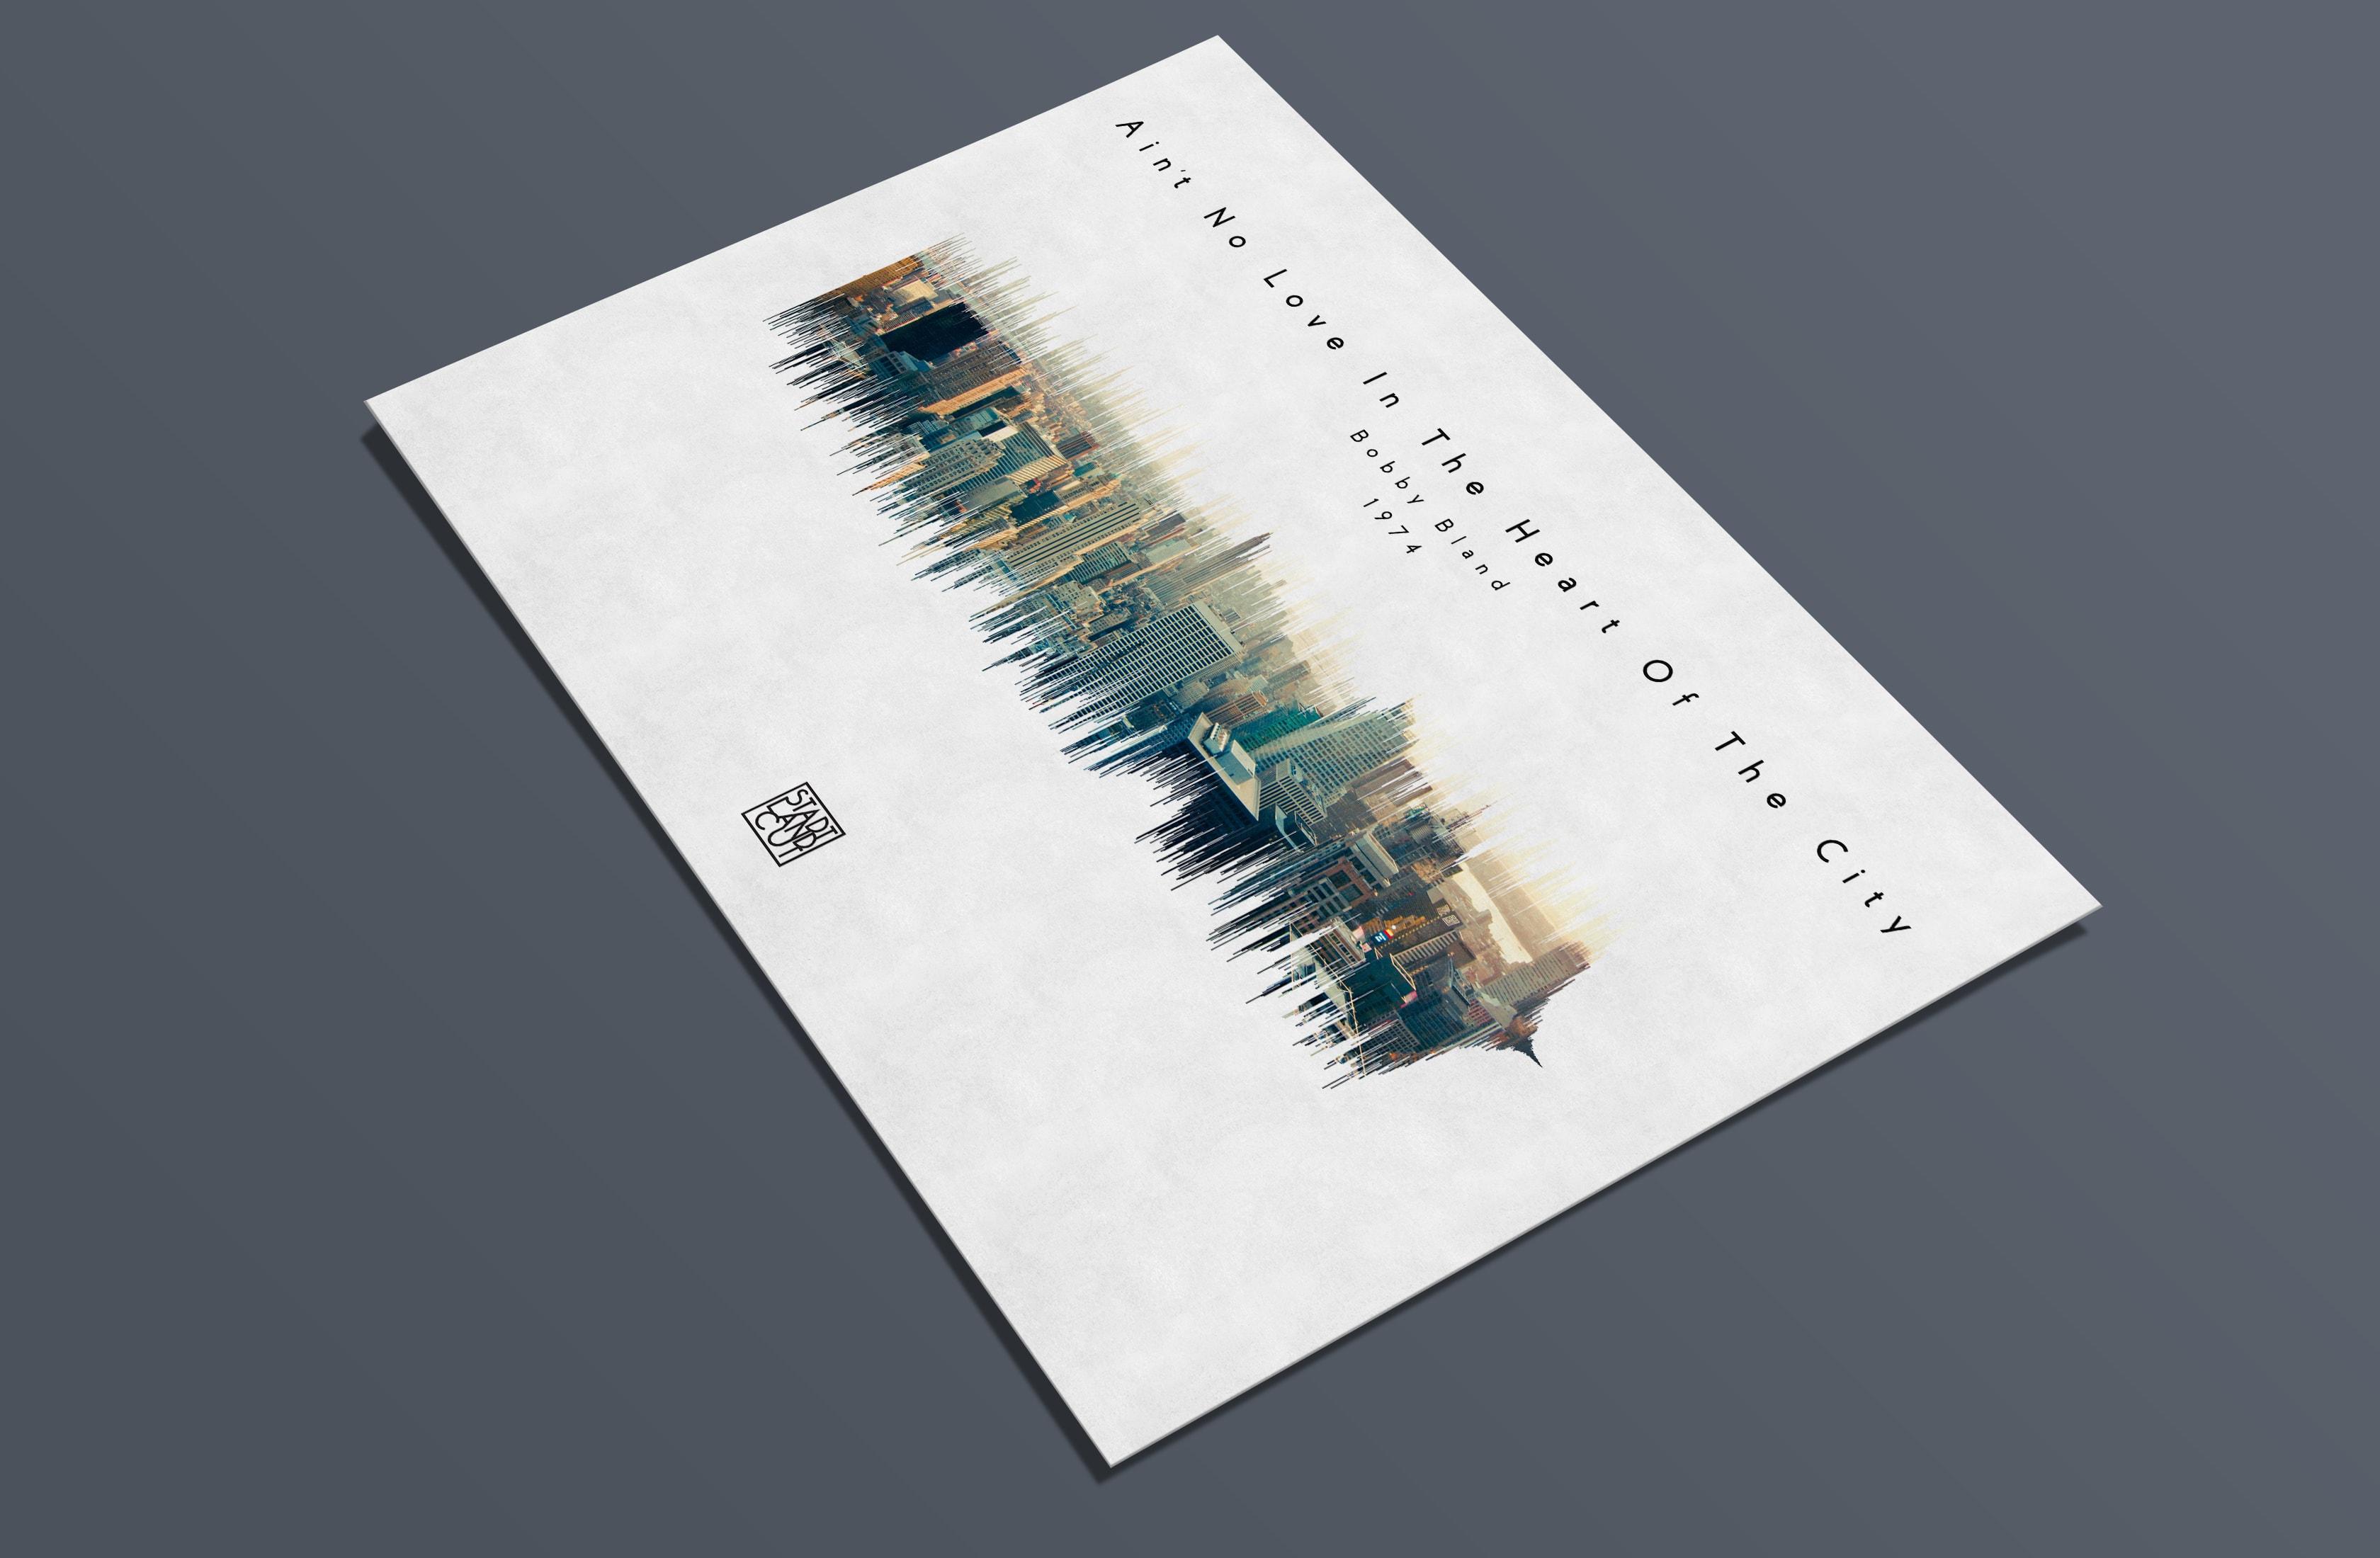 Soundprint@2x